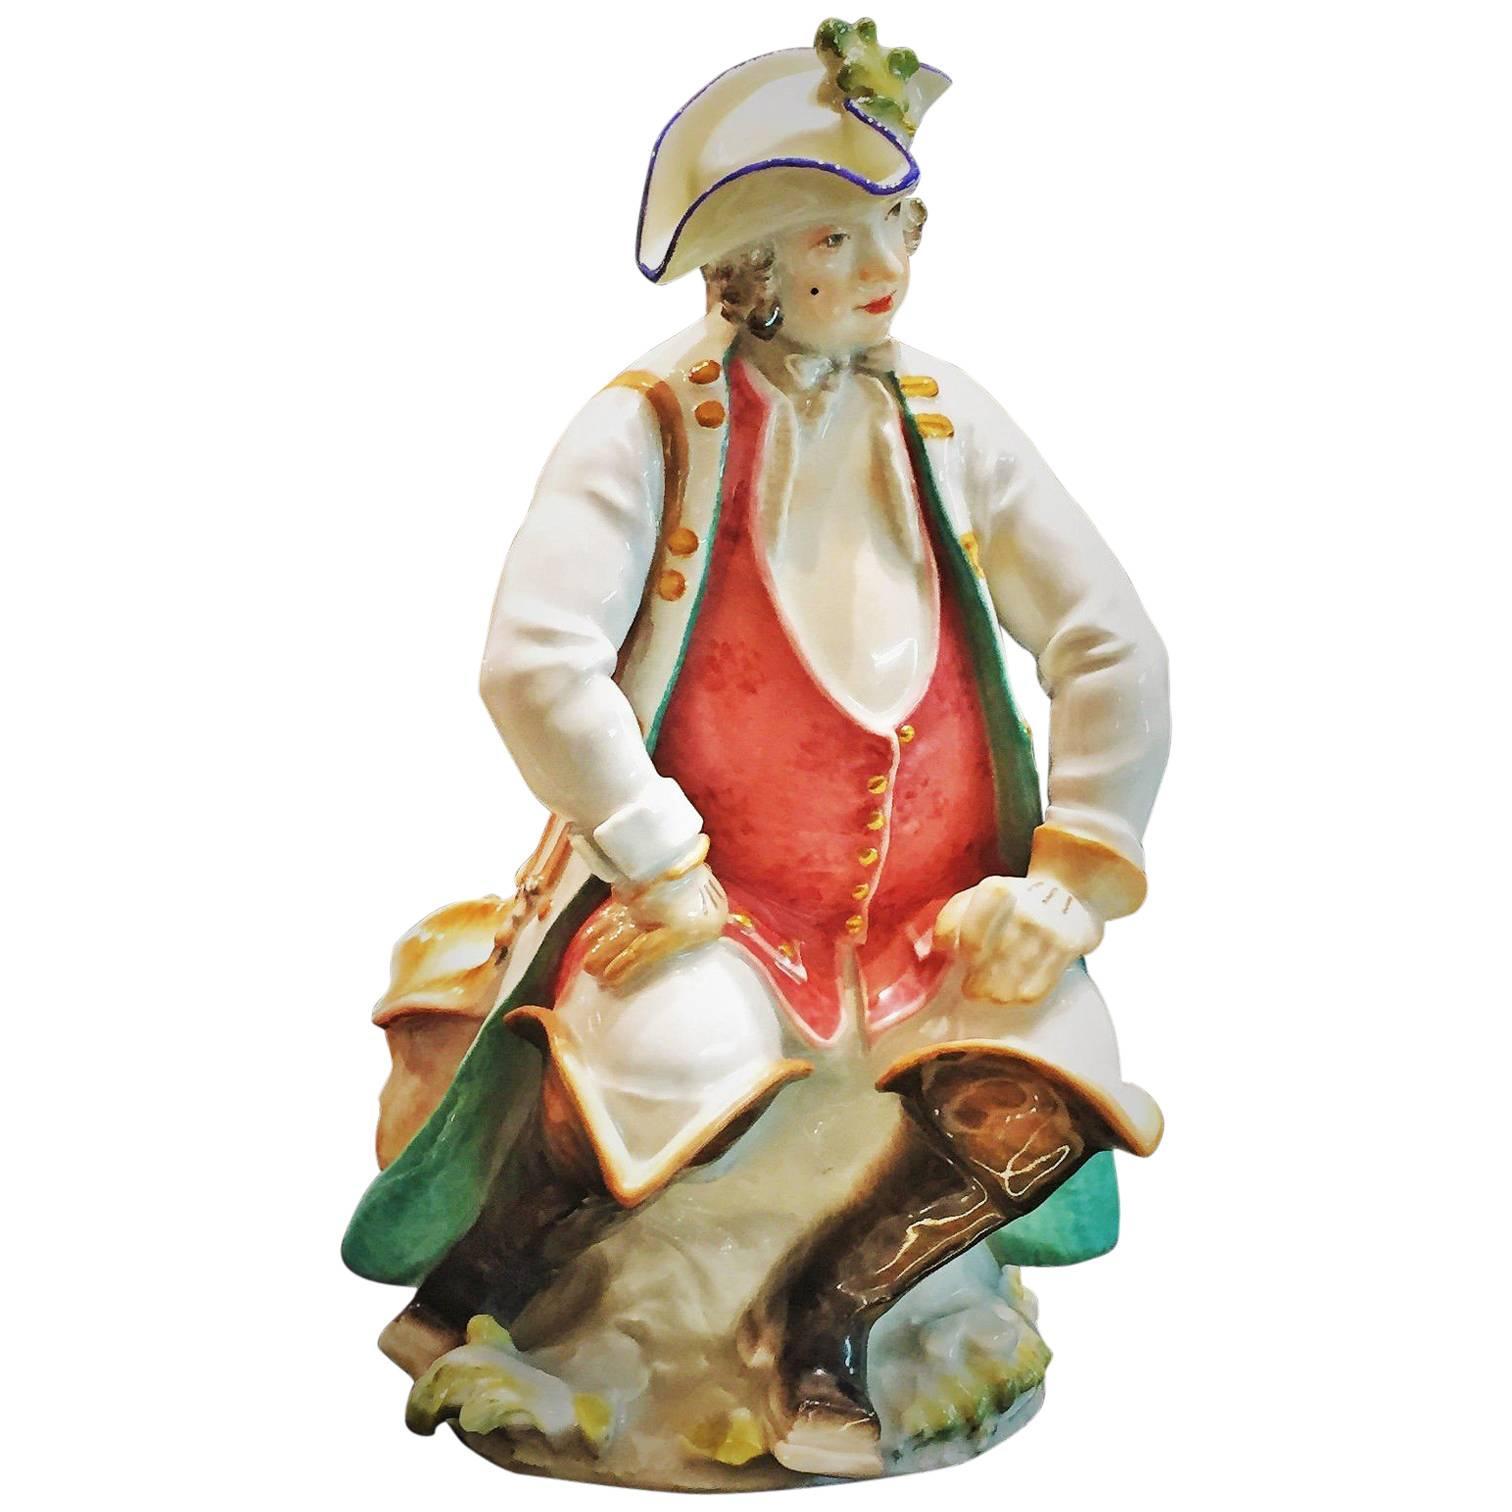 Paul Scheurich for Meissen, Resting Nobleman, Porcelain Sculpture, circa 1920